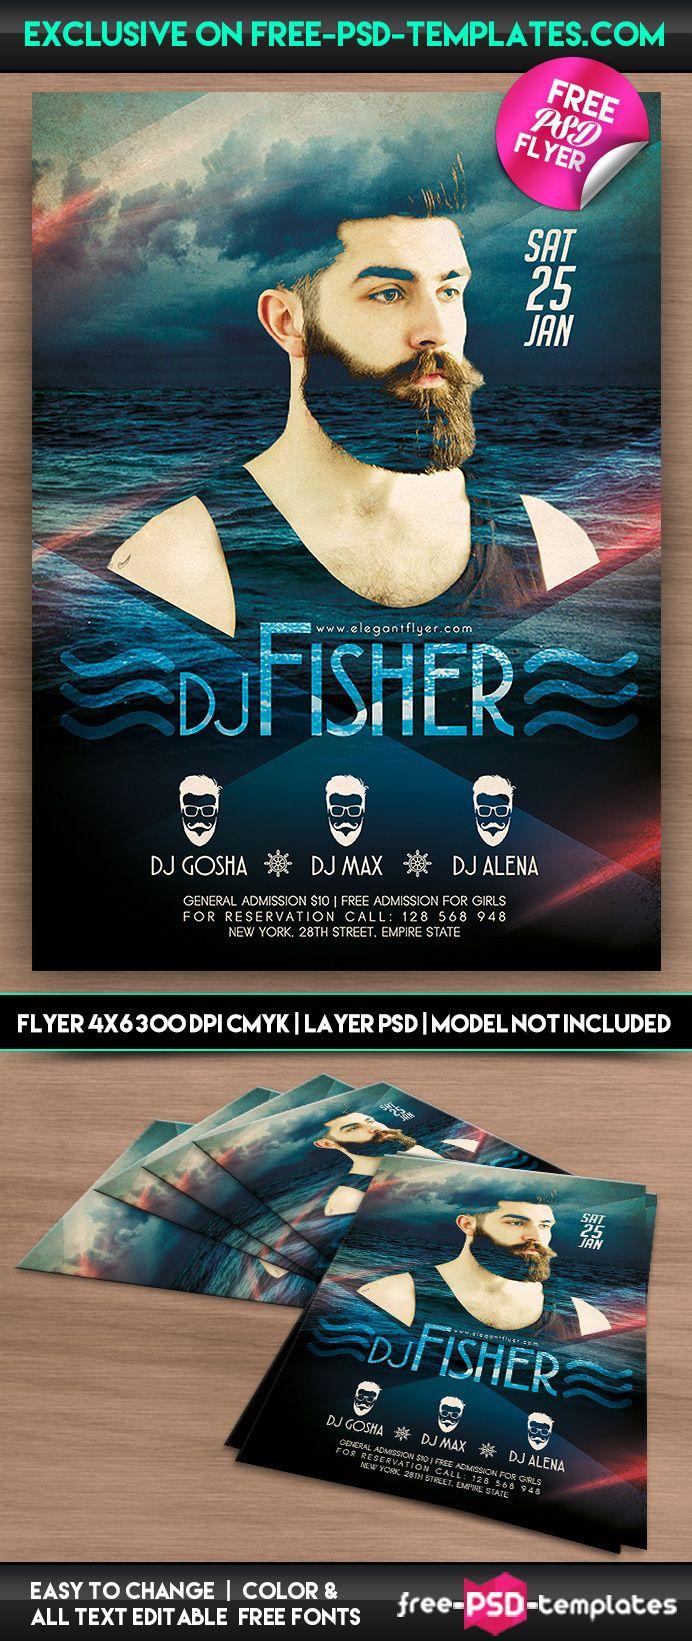 DJ Fisher – Free PSD Flyer Template on Behance   flyer   Pinterest ...